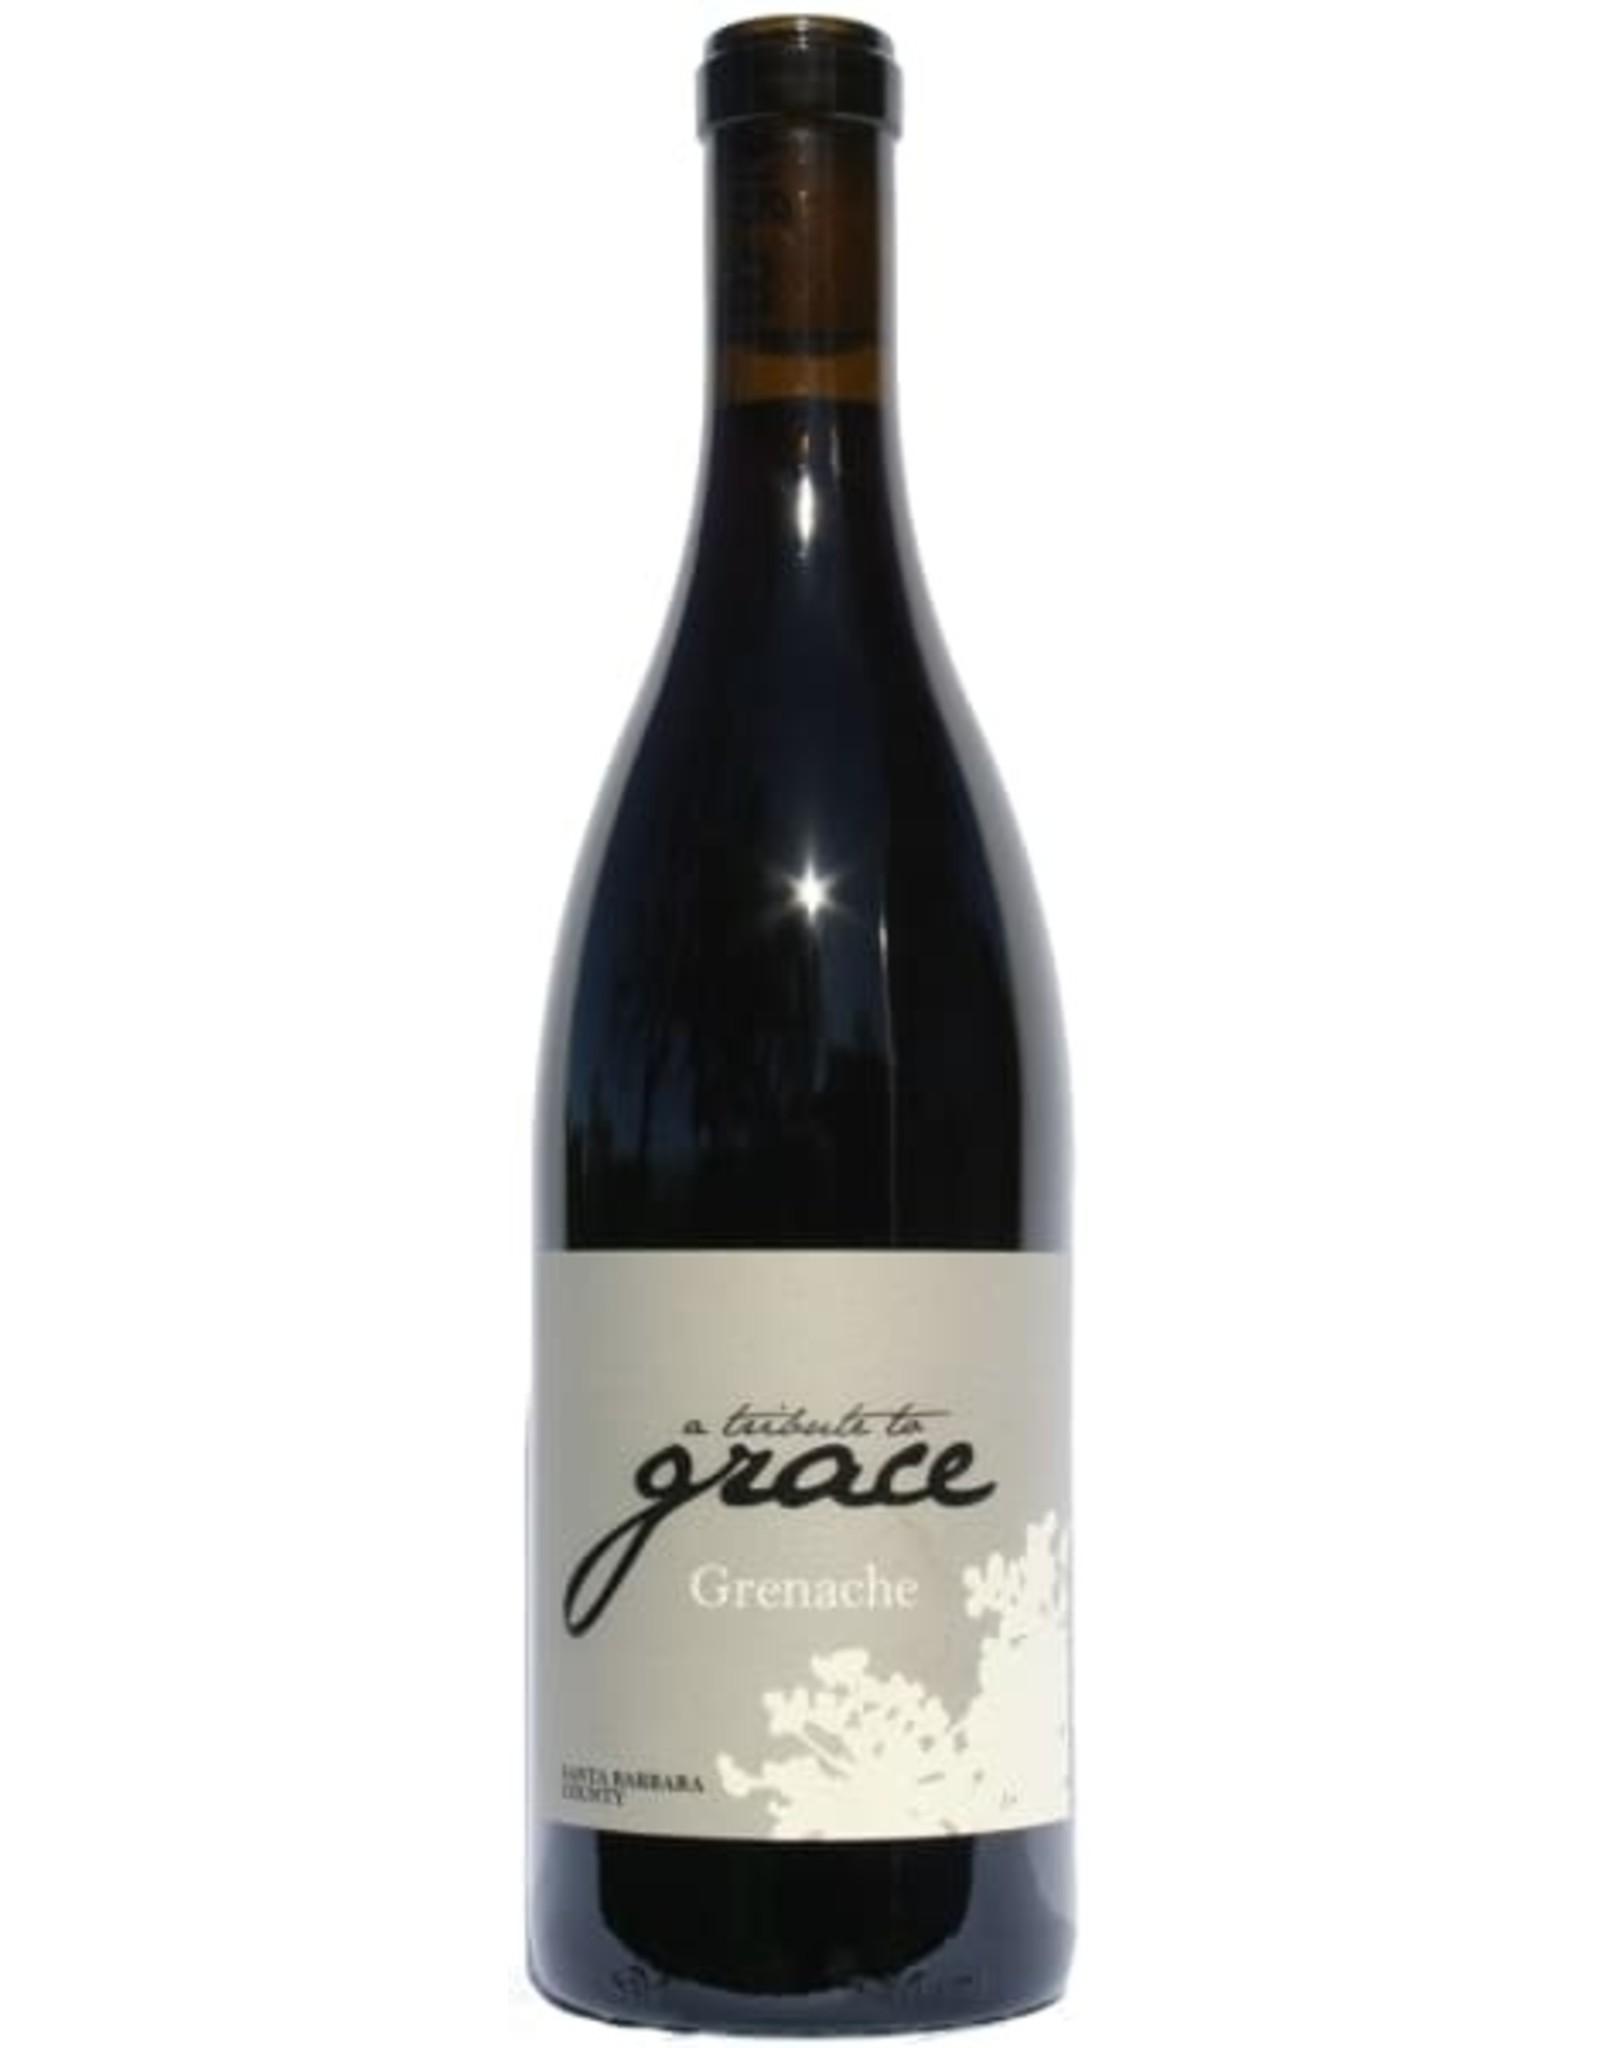 A Tribute to Grace A Tribute to Grace Grenache, Santa Barbara County 2018